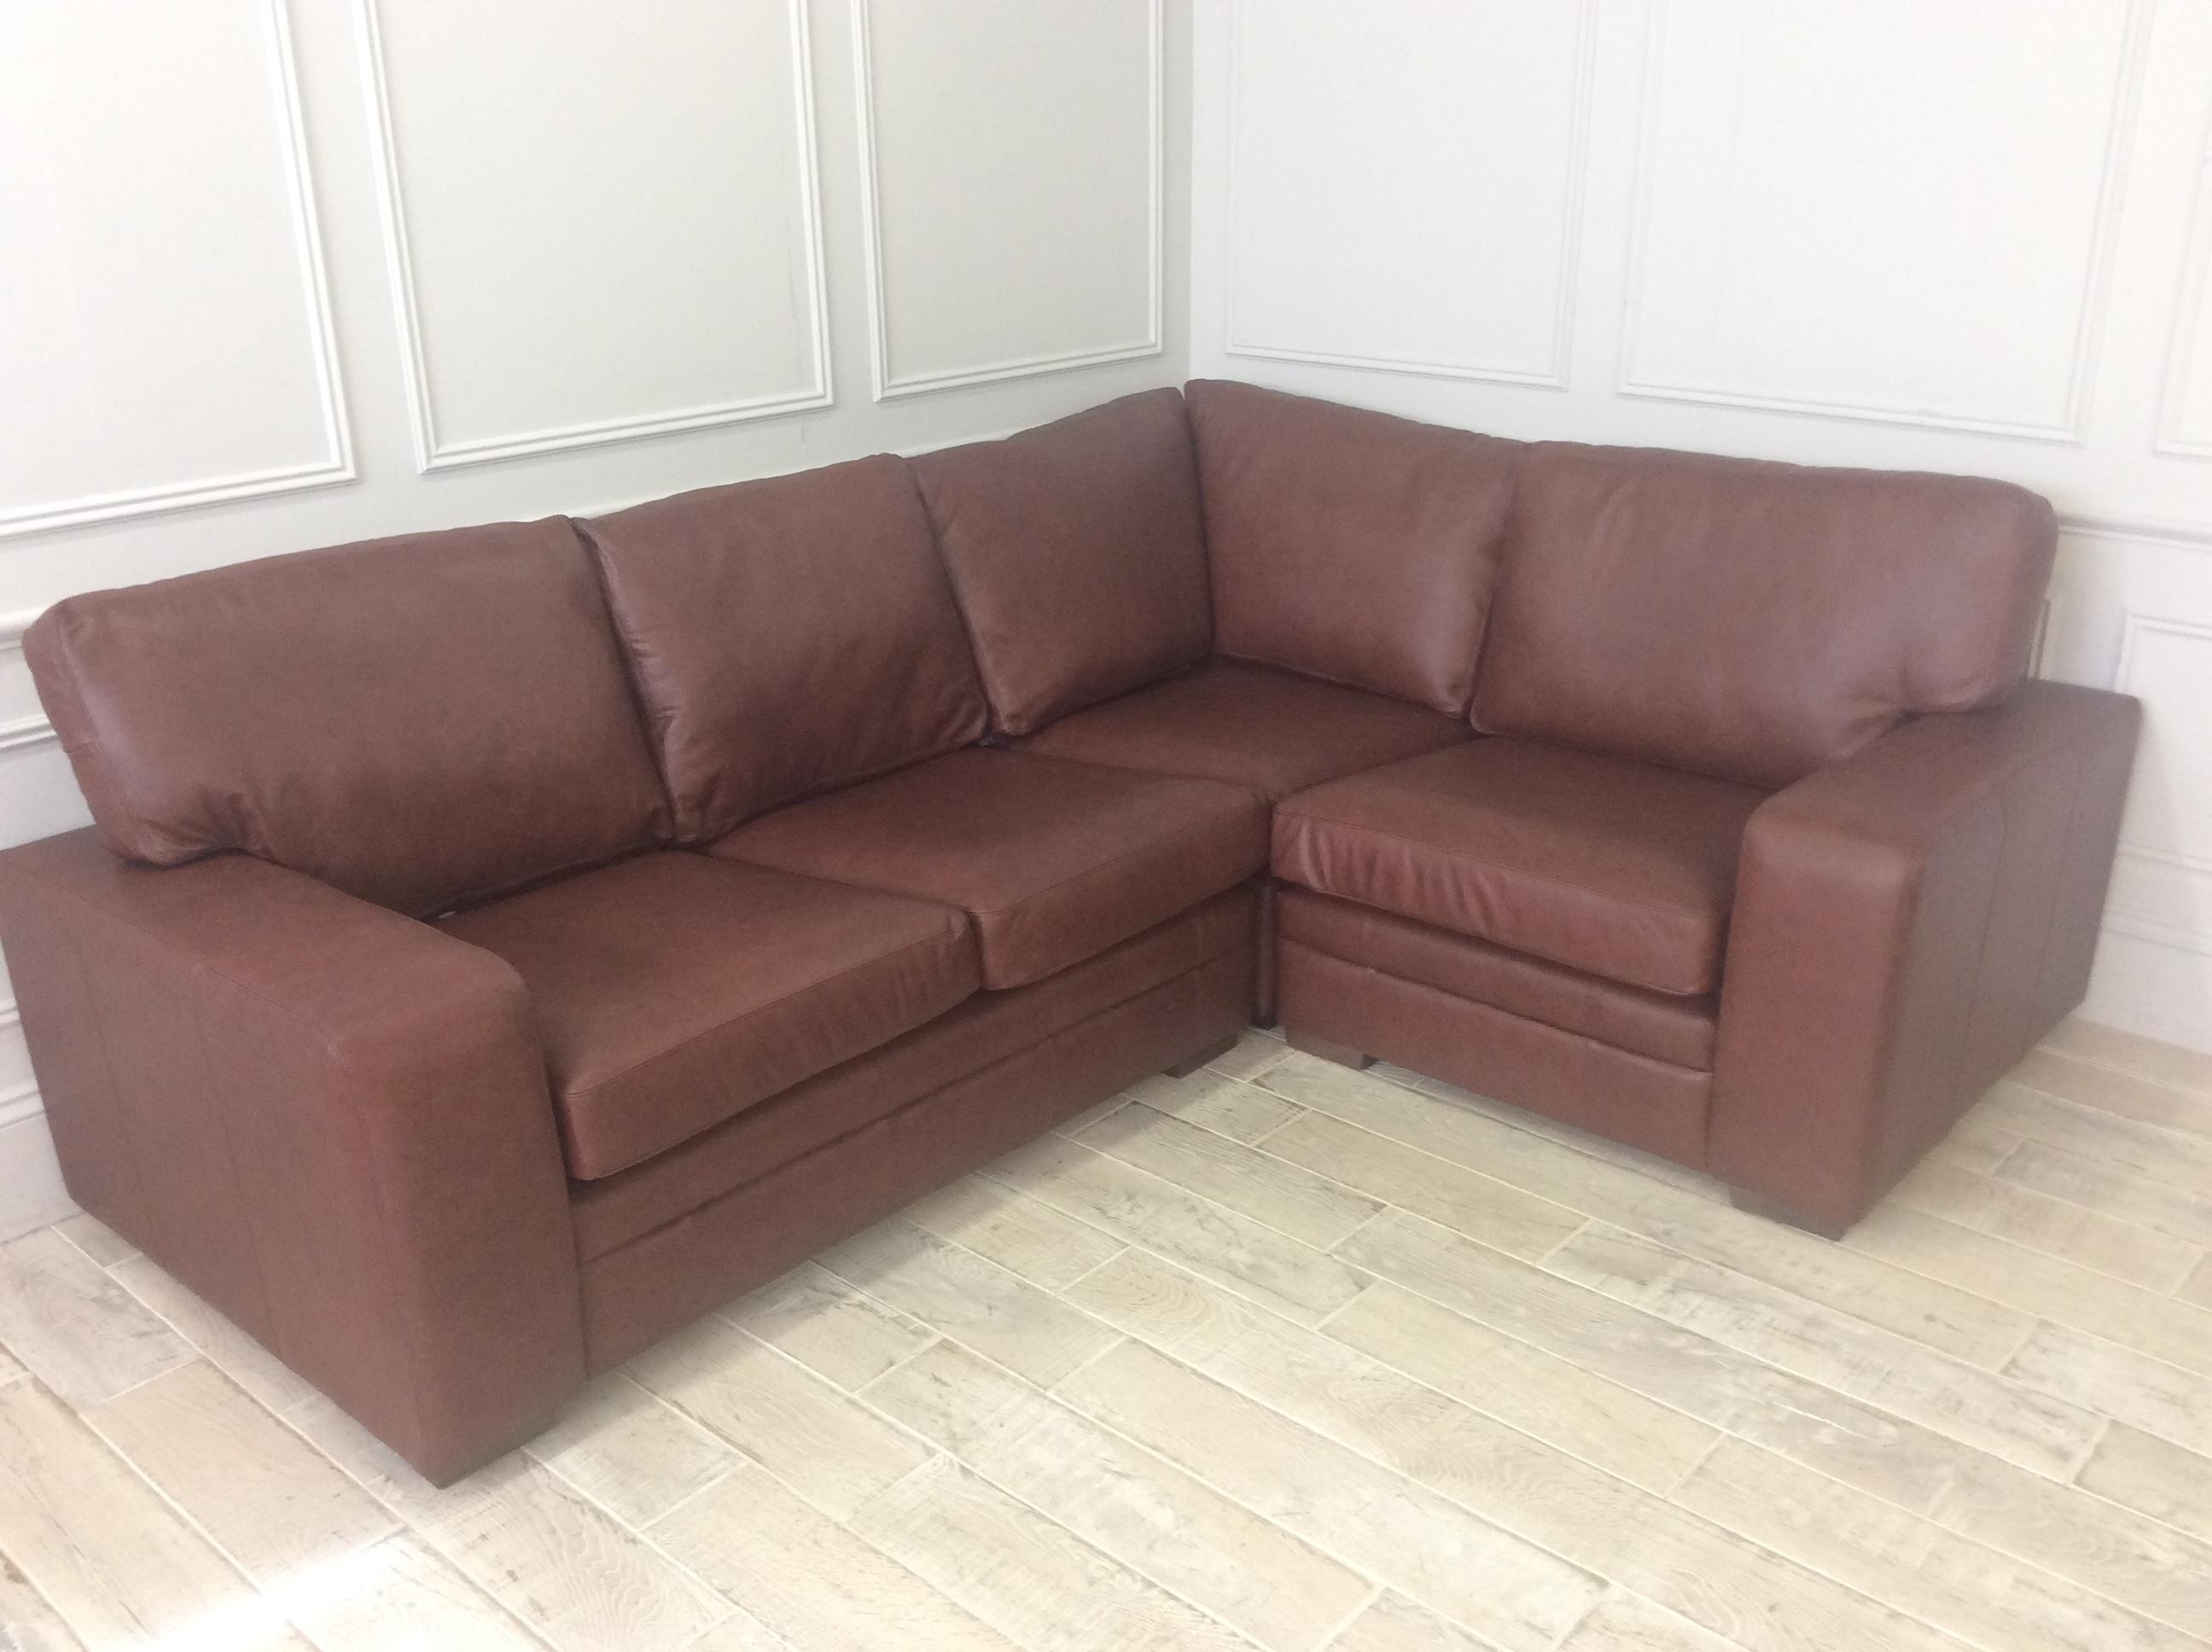 Product photograph showing Sloane 2 5 X 1 5 Seater Corner Sofa In Dune Hazel Leather 3 Units